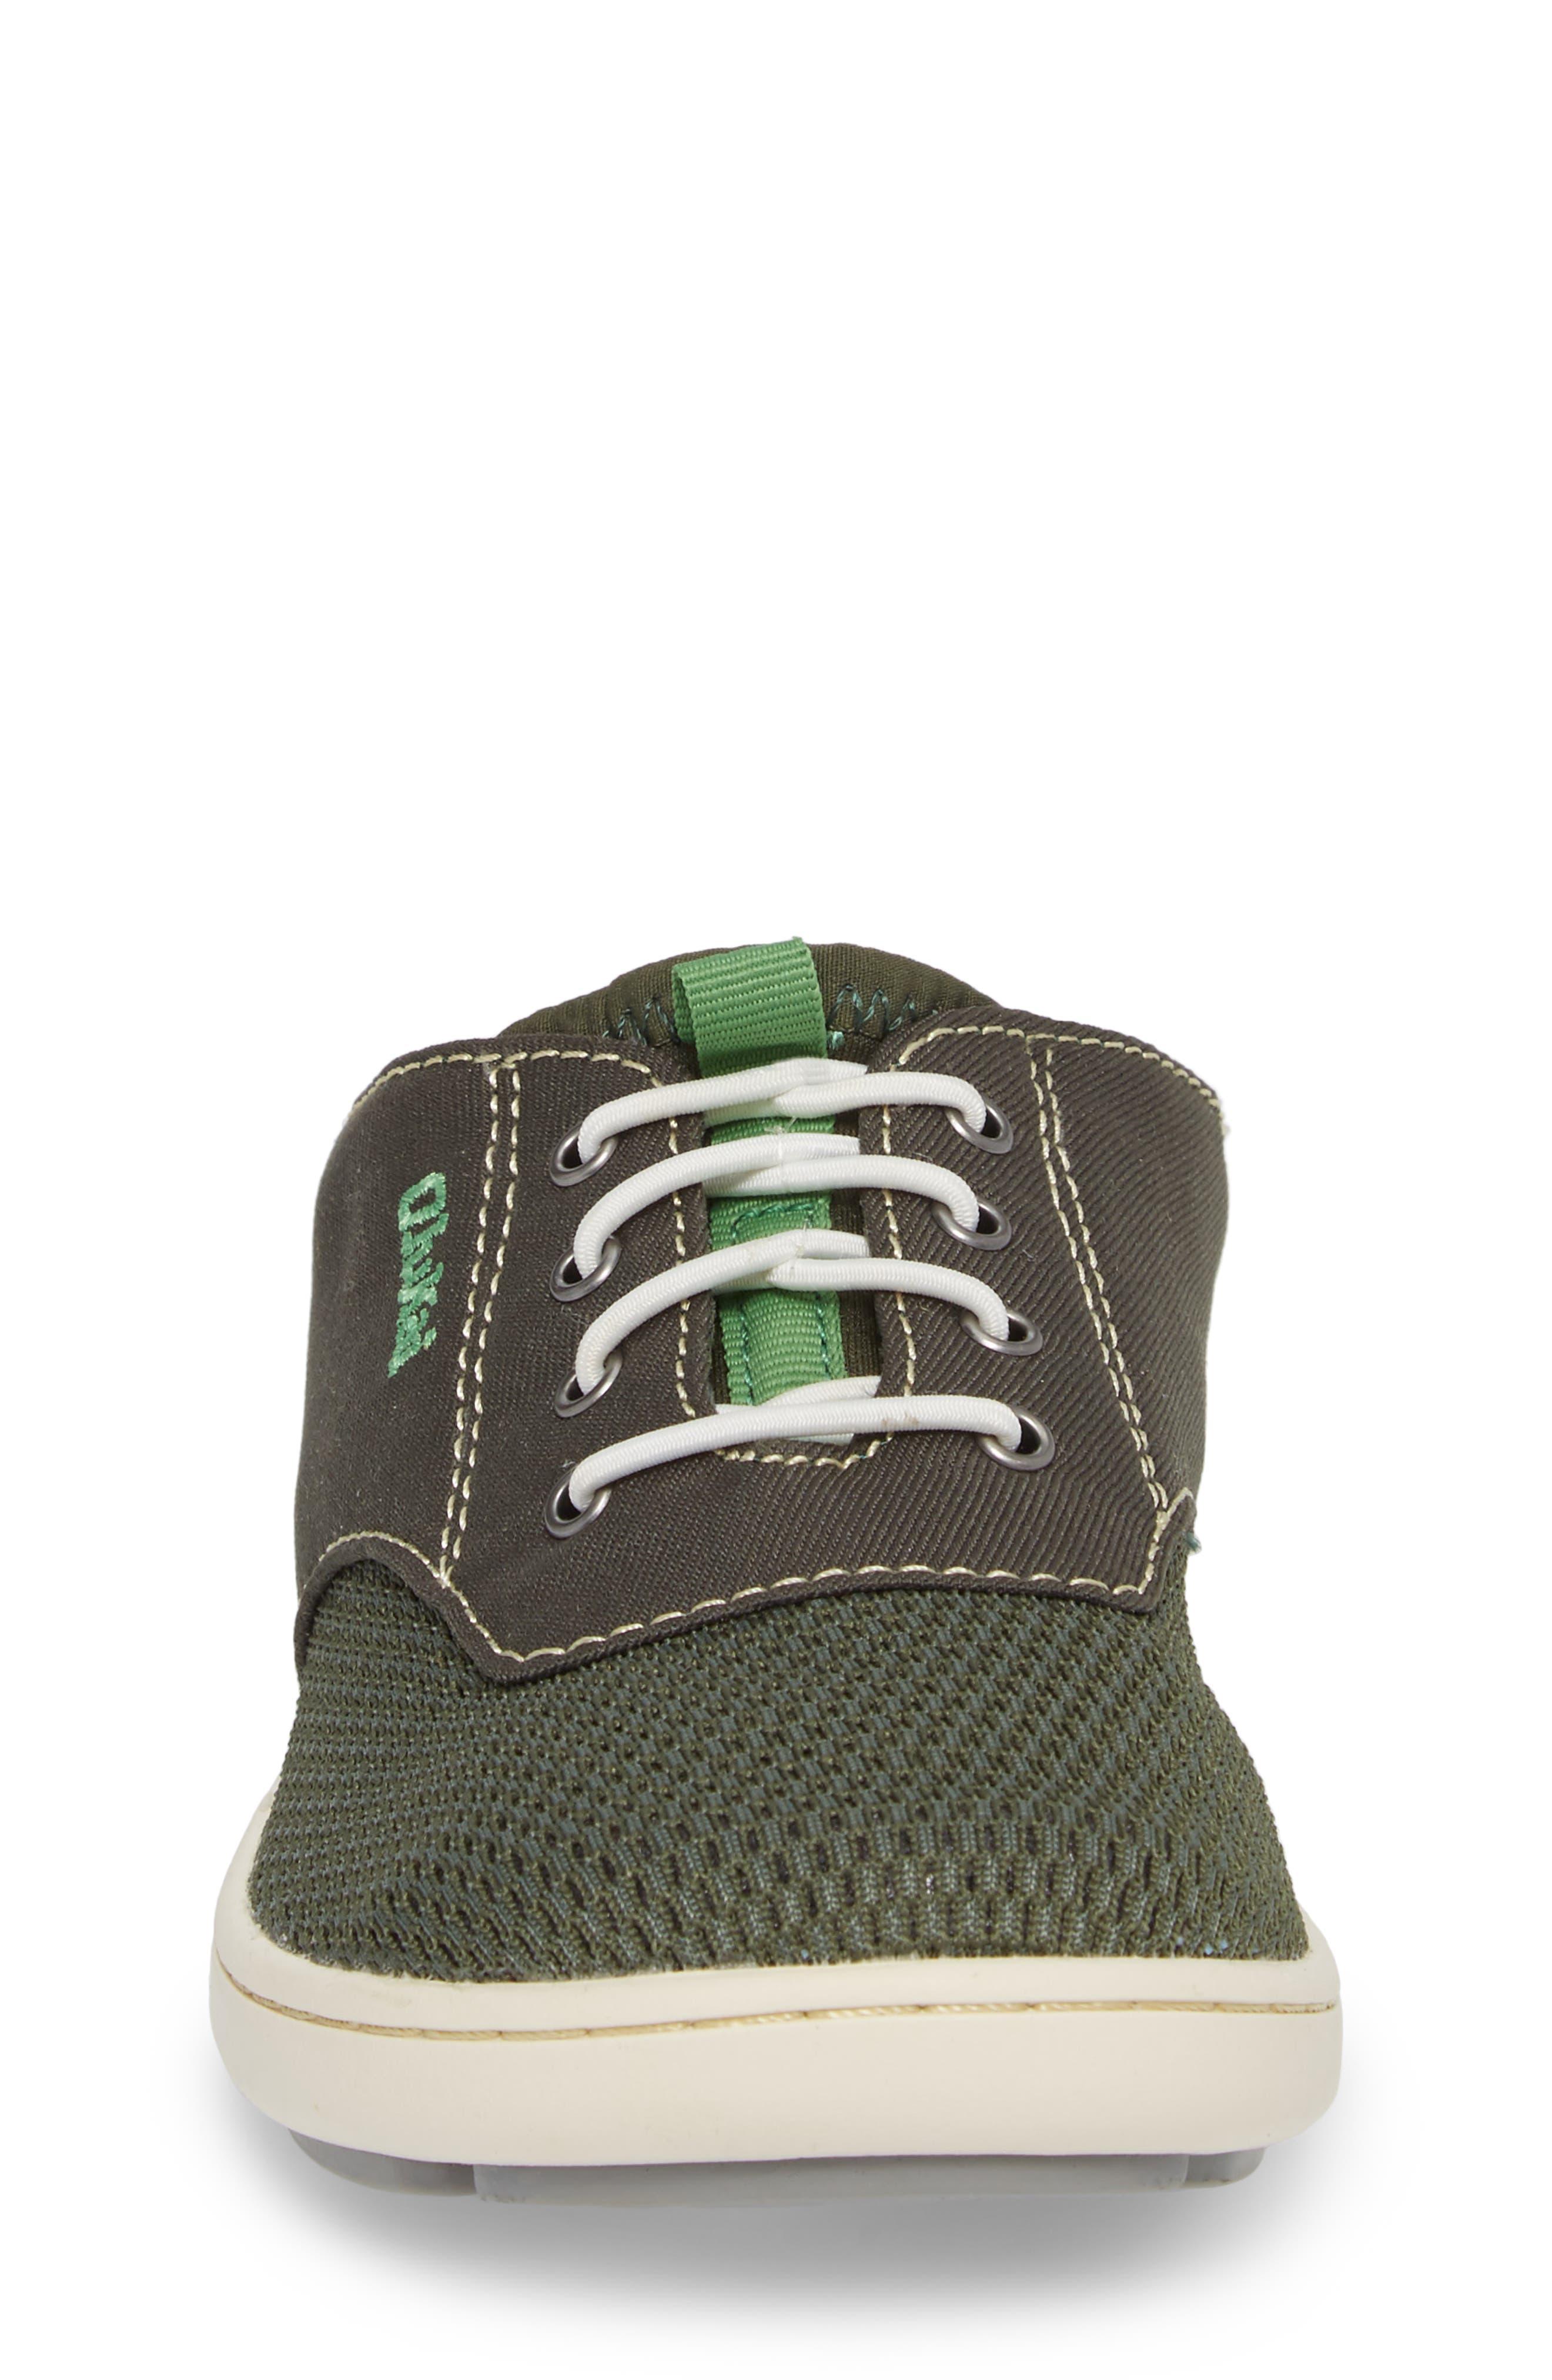 Nohea Moku Water Resistant Shoe,                             Alternate thumbnail 5, color,                             SEA GRASS/ SEA GRASS